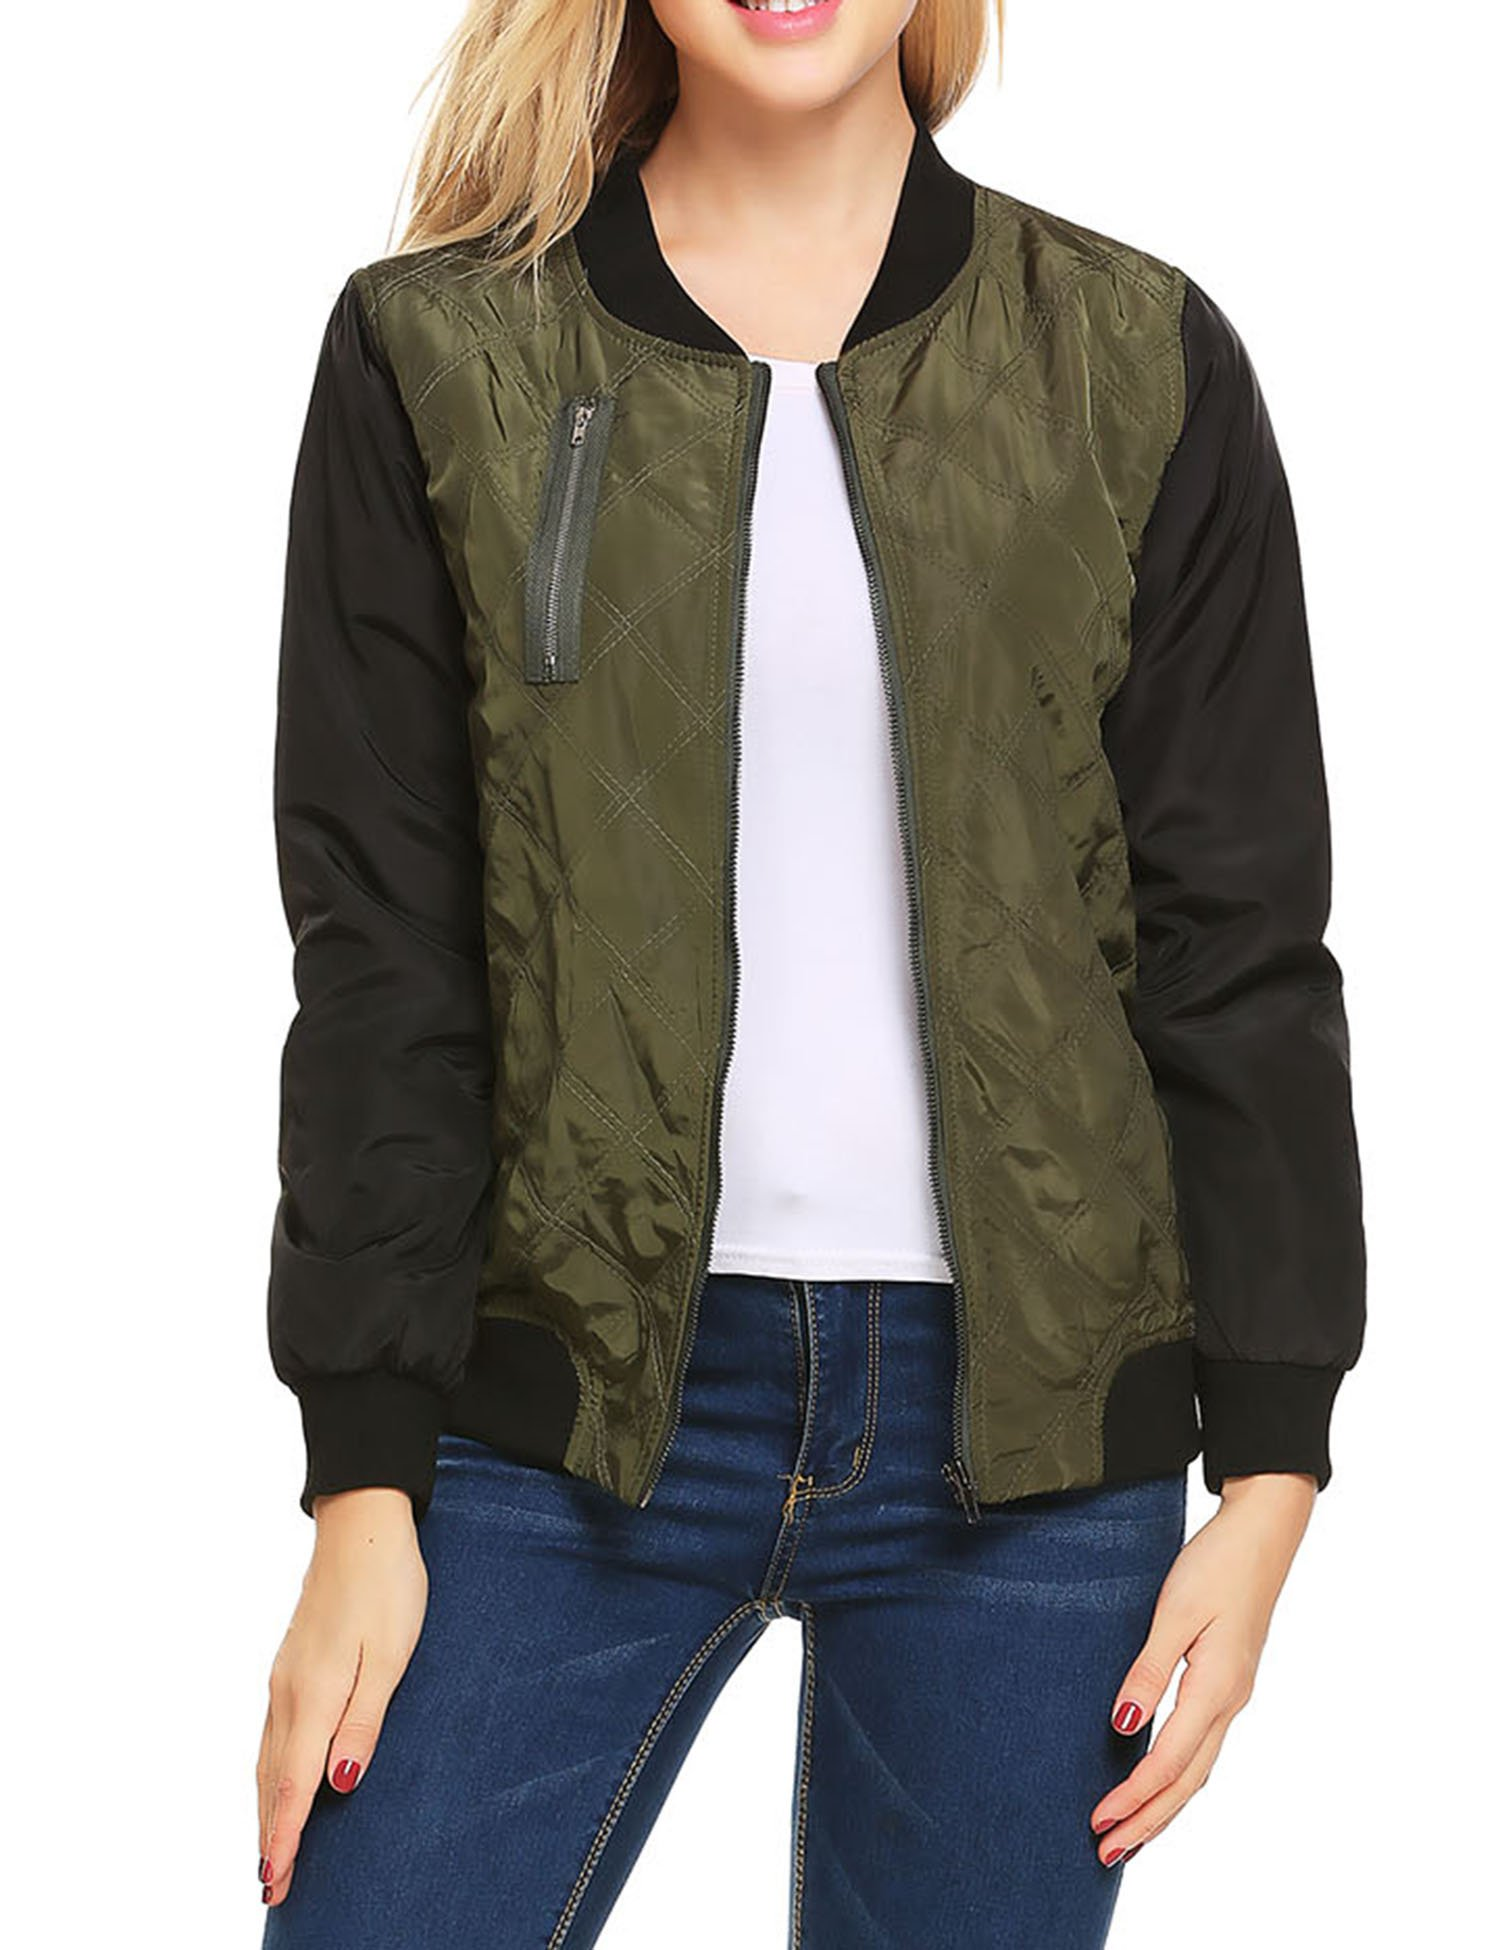 Beyove Women's Womens Bomber Jacket Classic Style Zip Up Biker Vintage Jacket